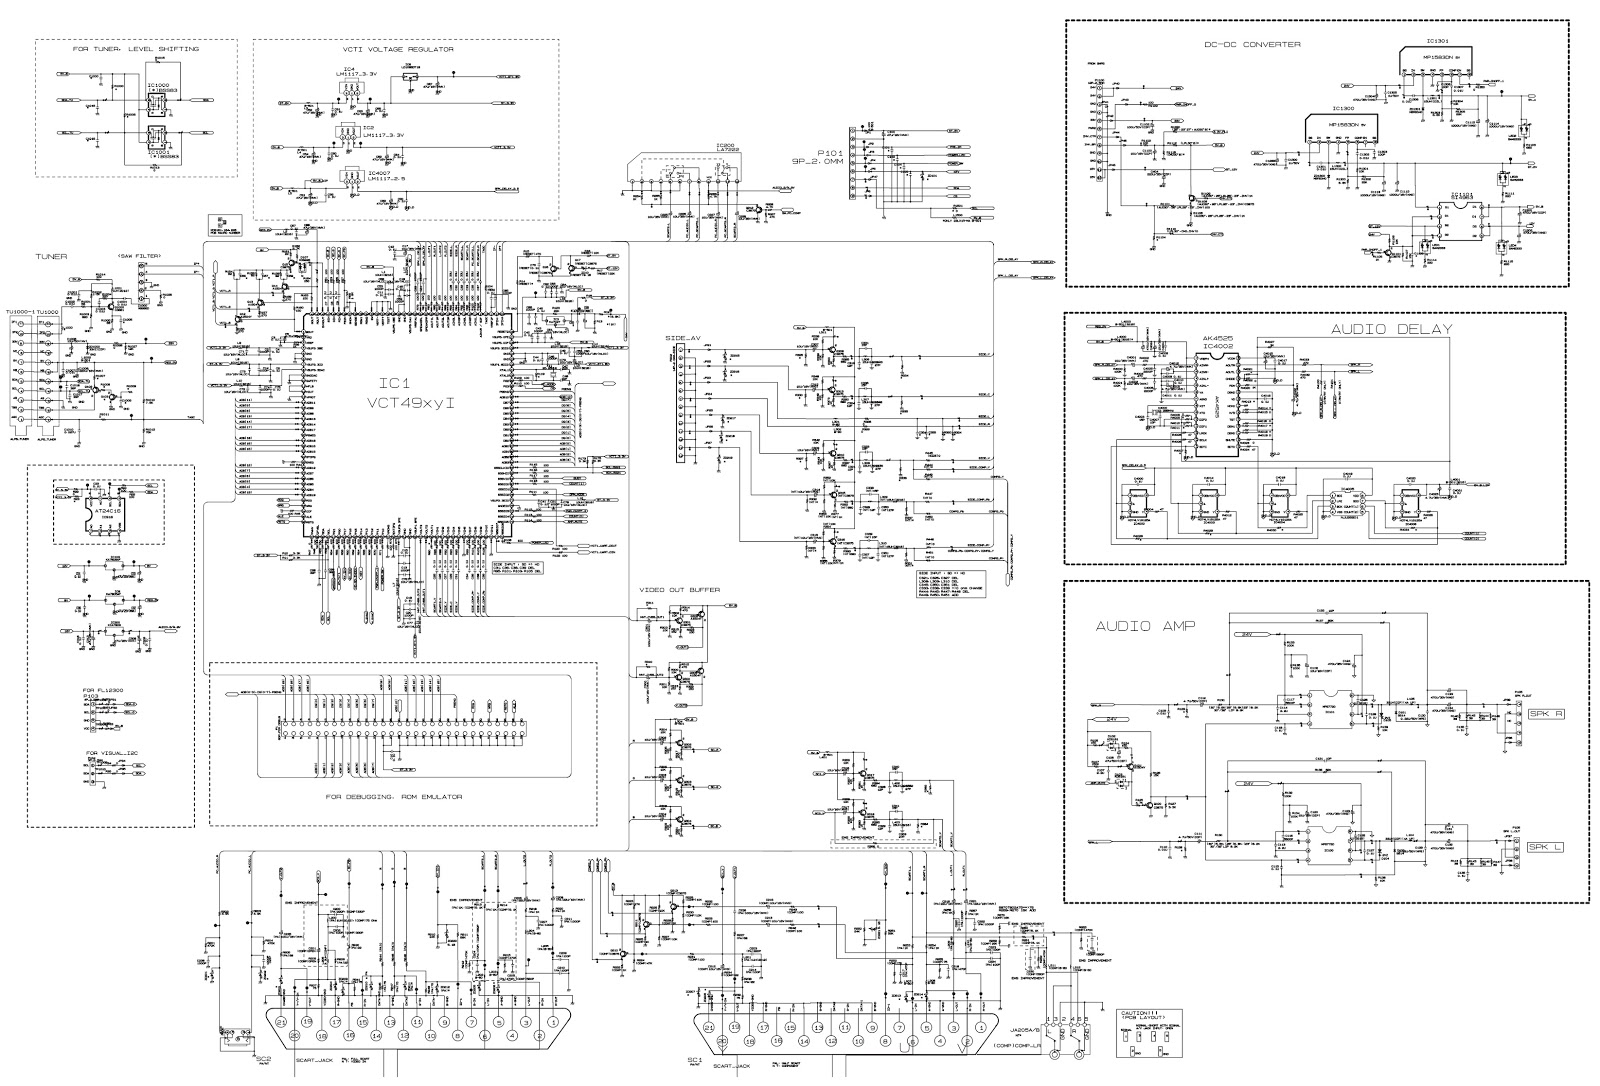 tv tuner card circuit diagram hobby caravan 12v wiring rz26lz55 lg lcd schematic diagrams